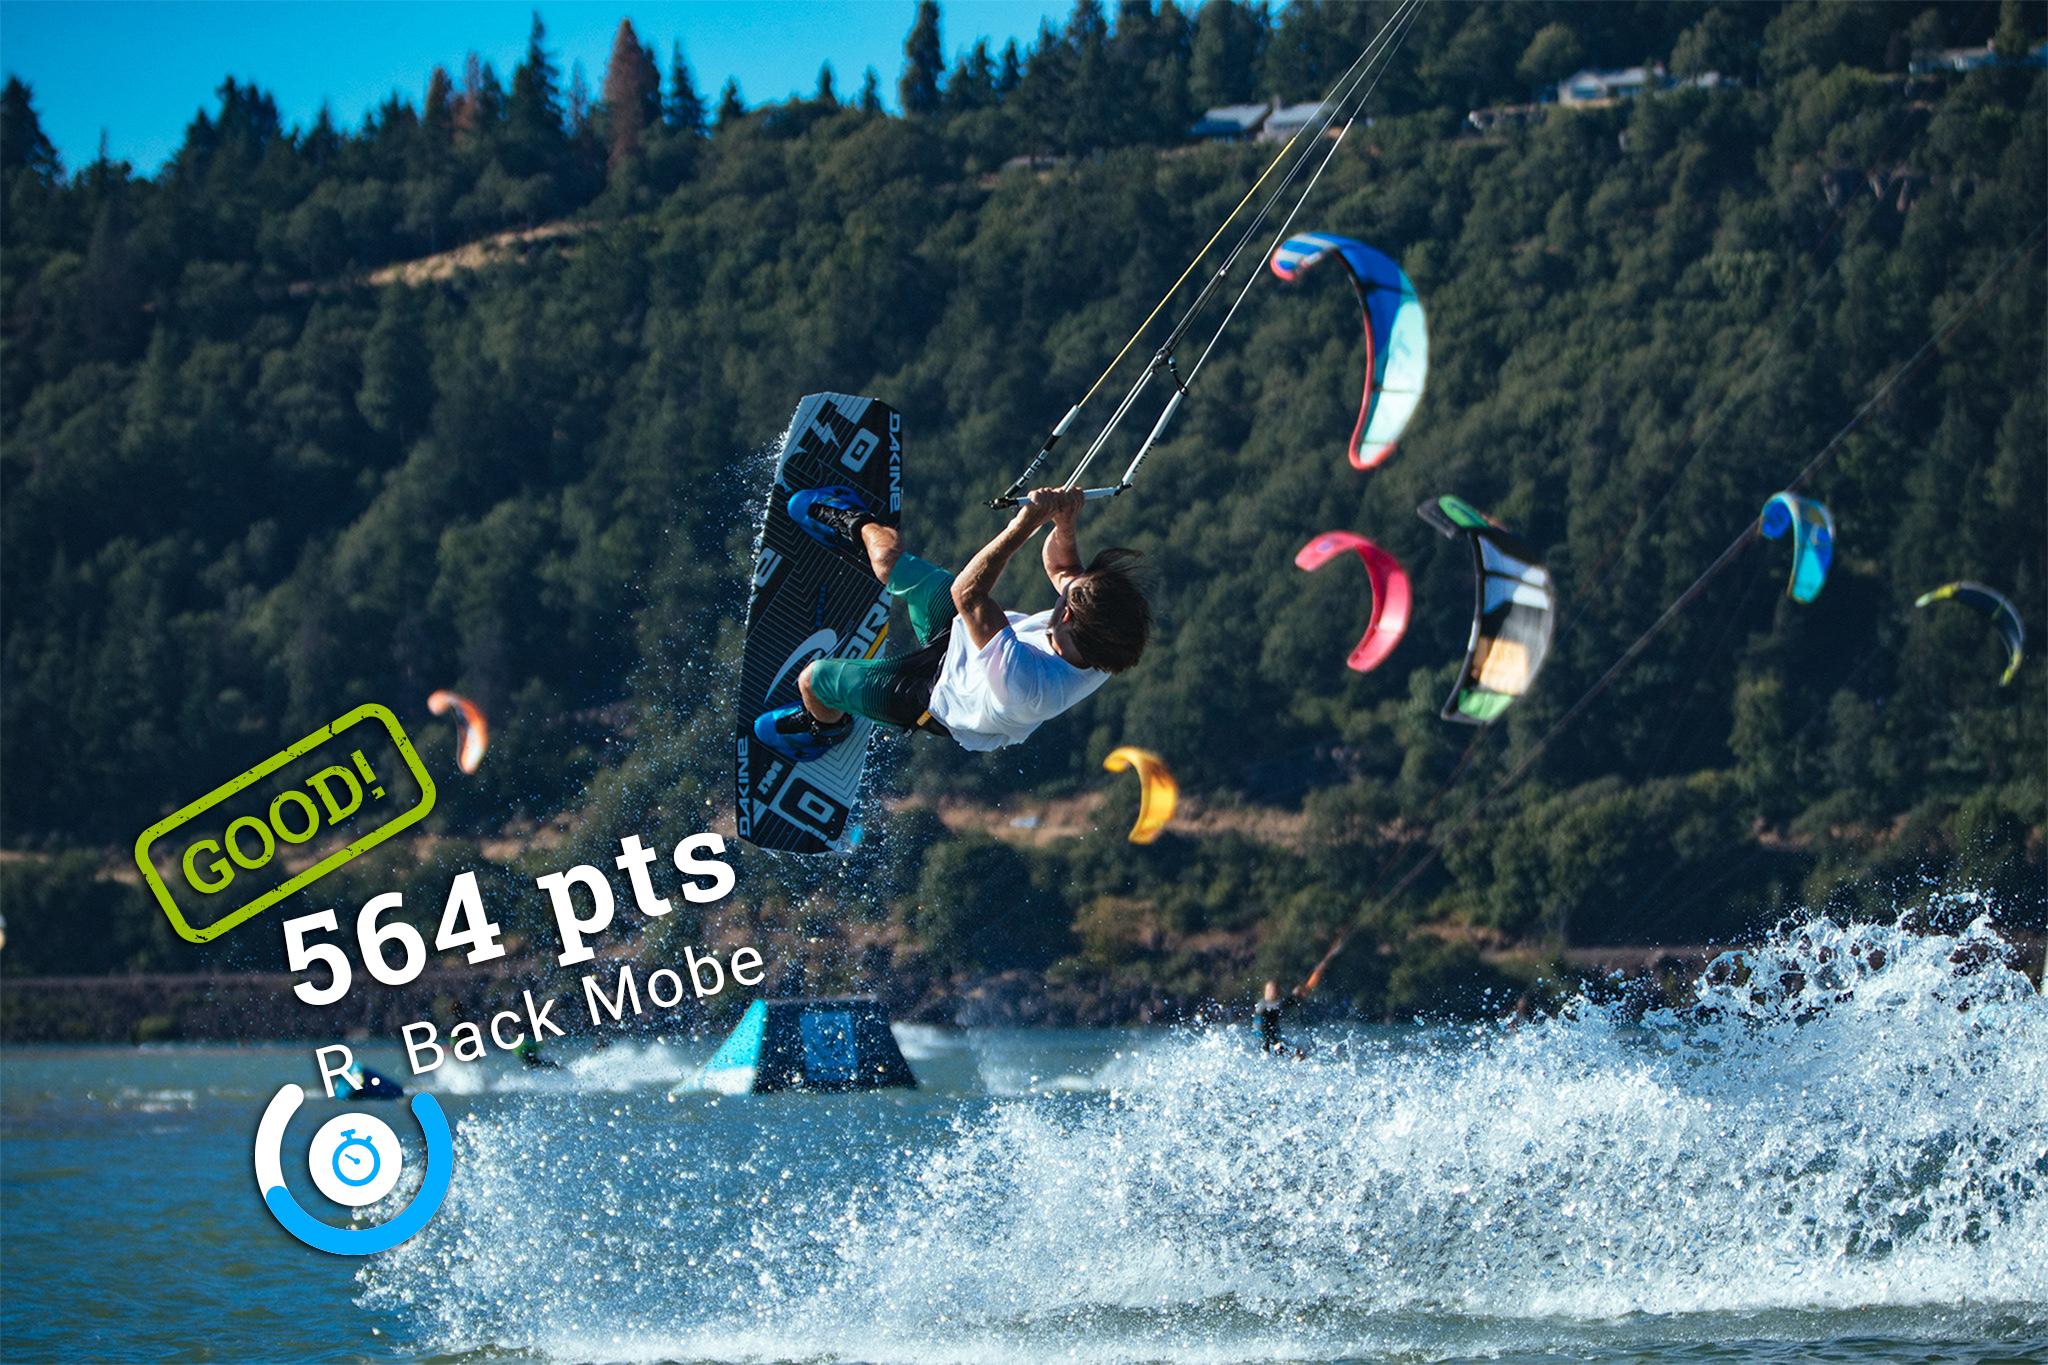 woo_kite_overlay_freestyle_2048.jpg